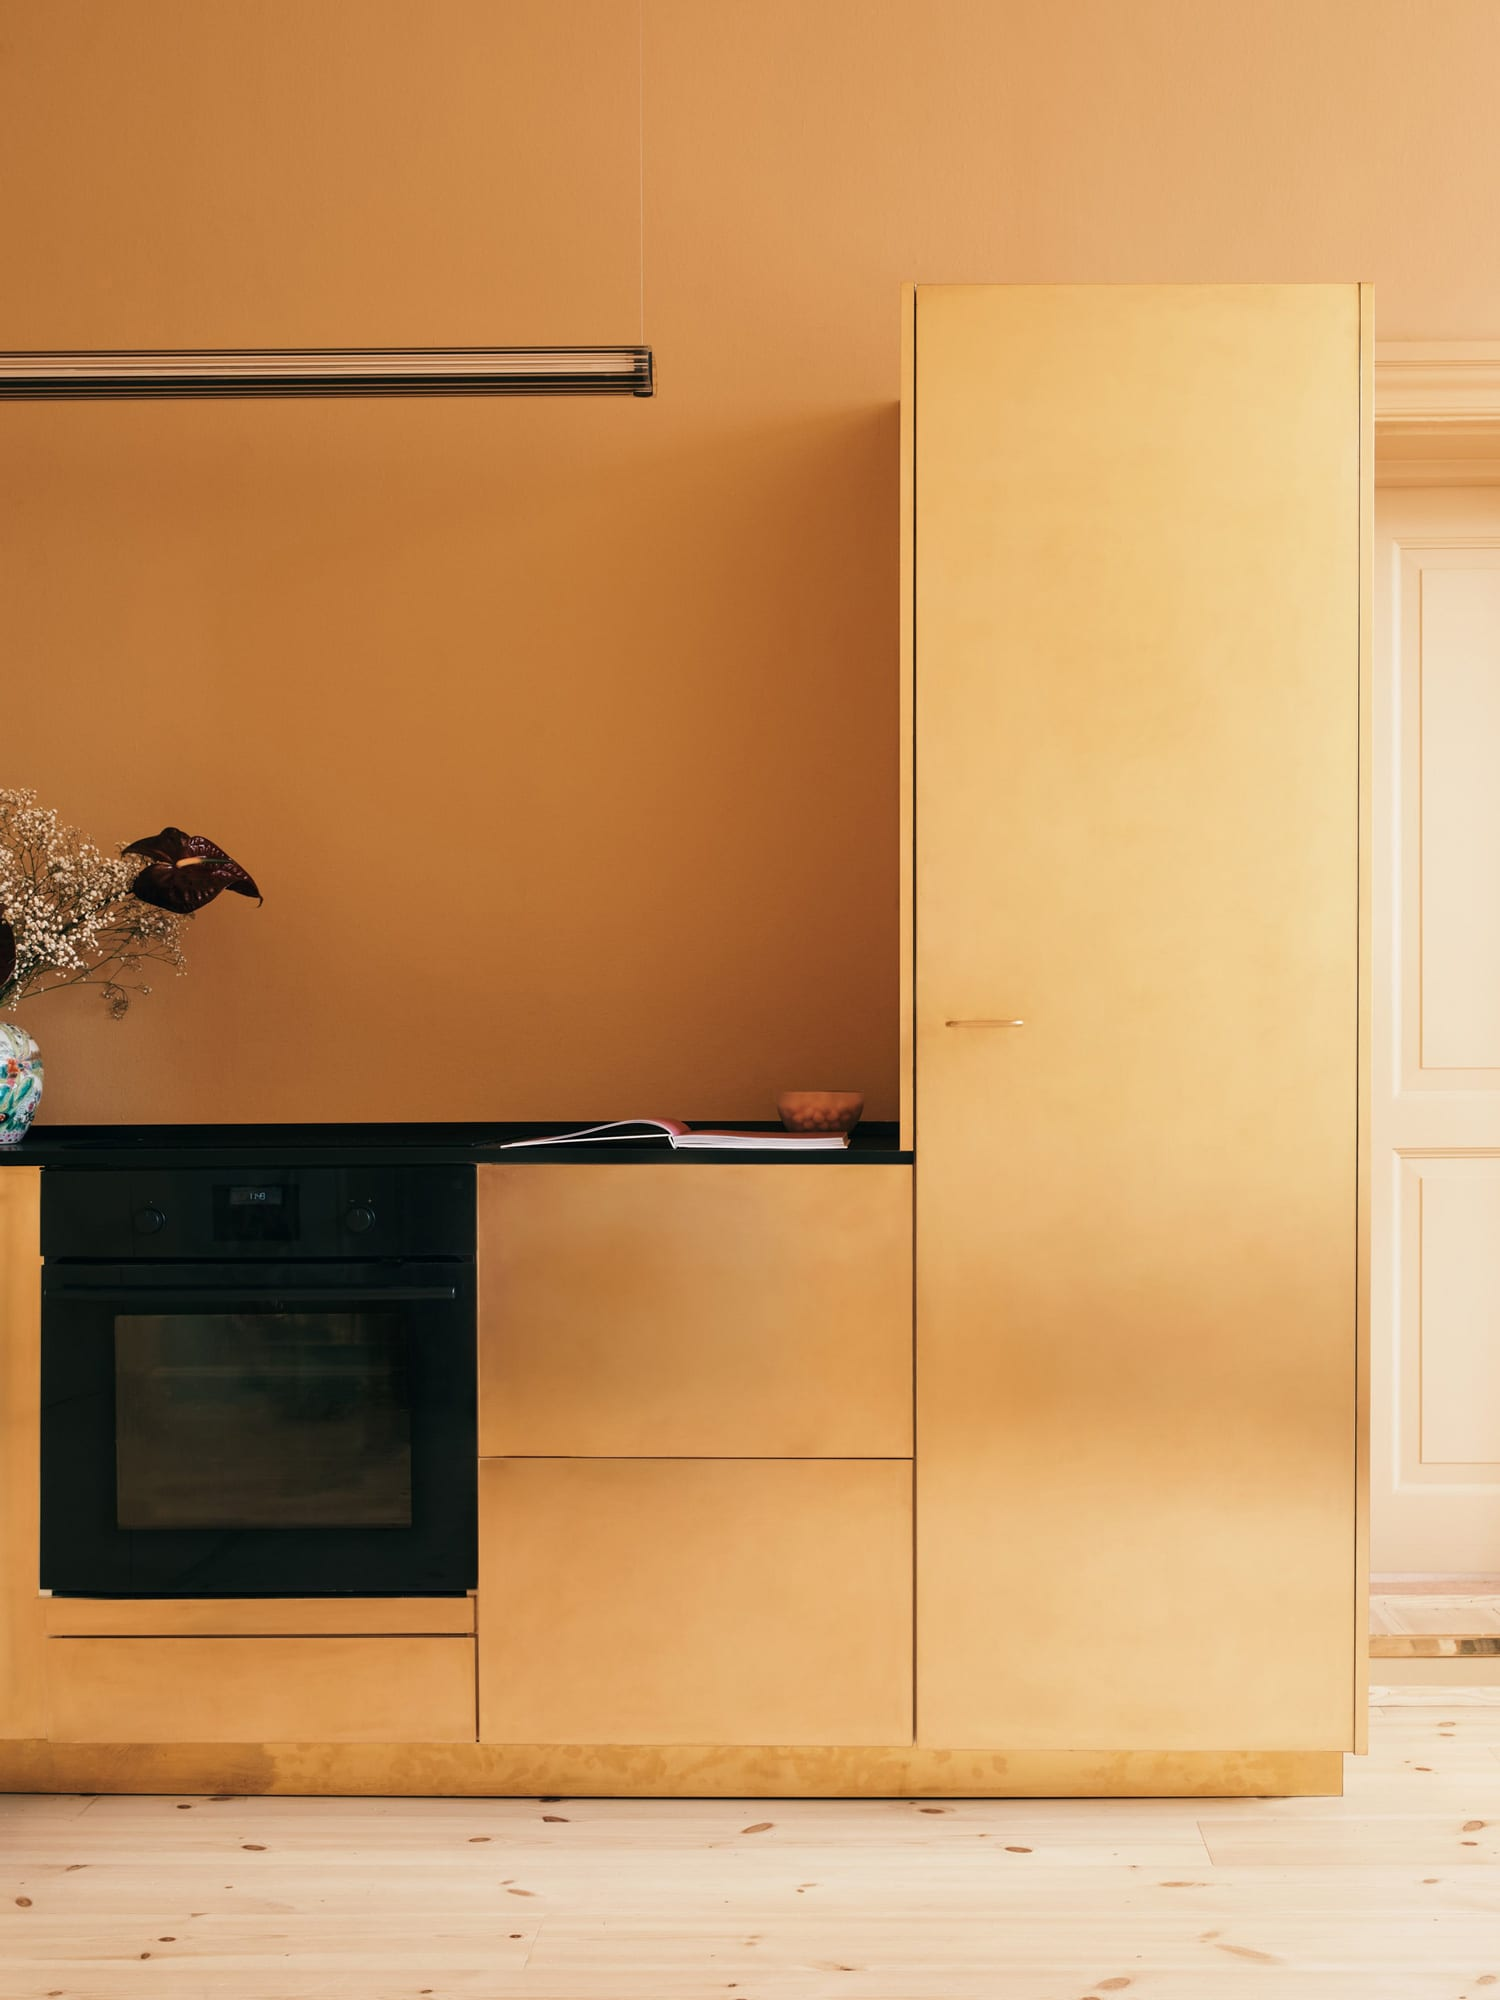 Solid Gold: Danish Fashion Designer Stine Goya's Studio Kitchen | Yellowtrace